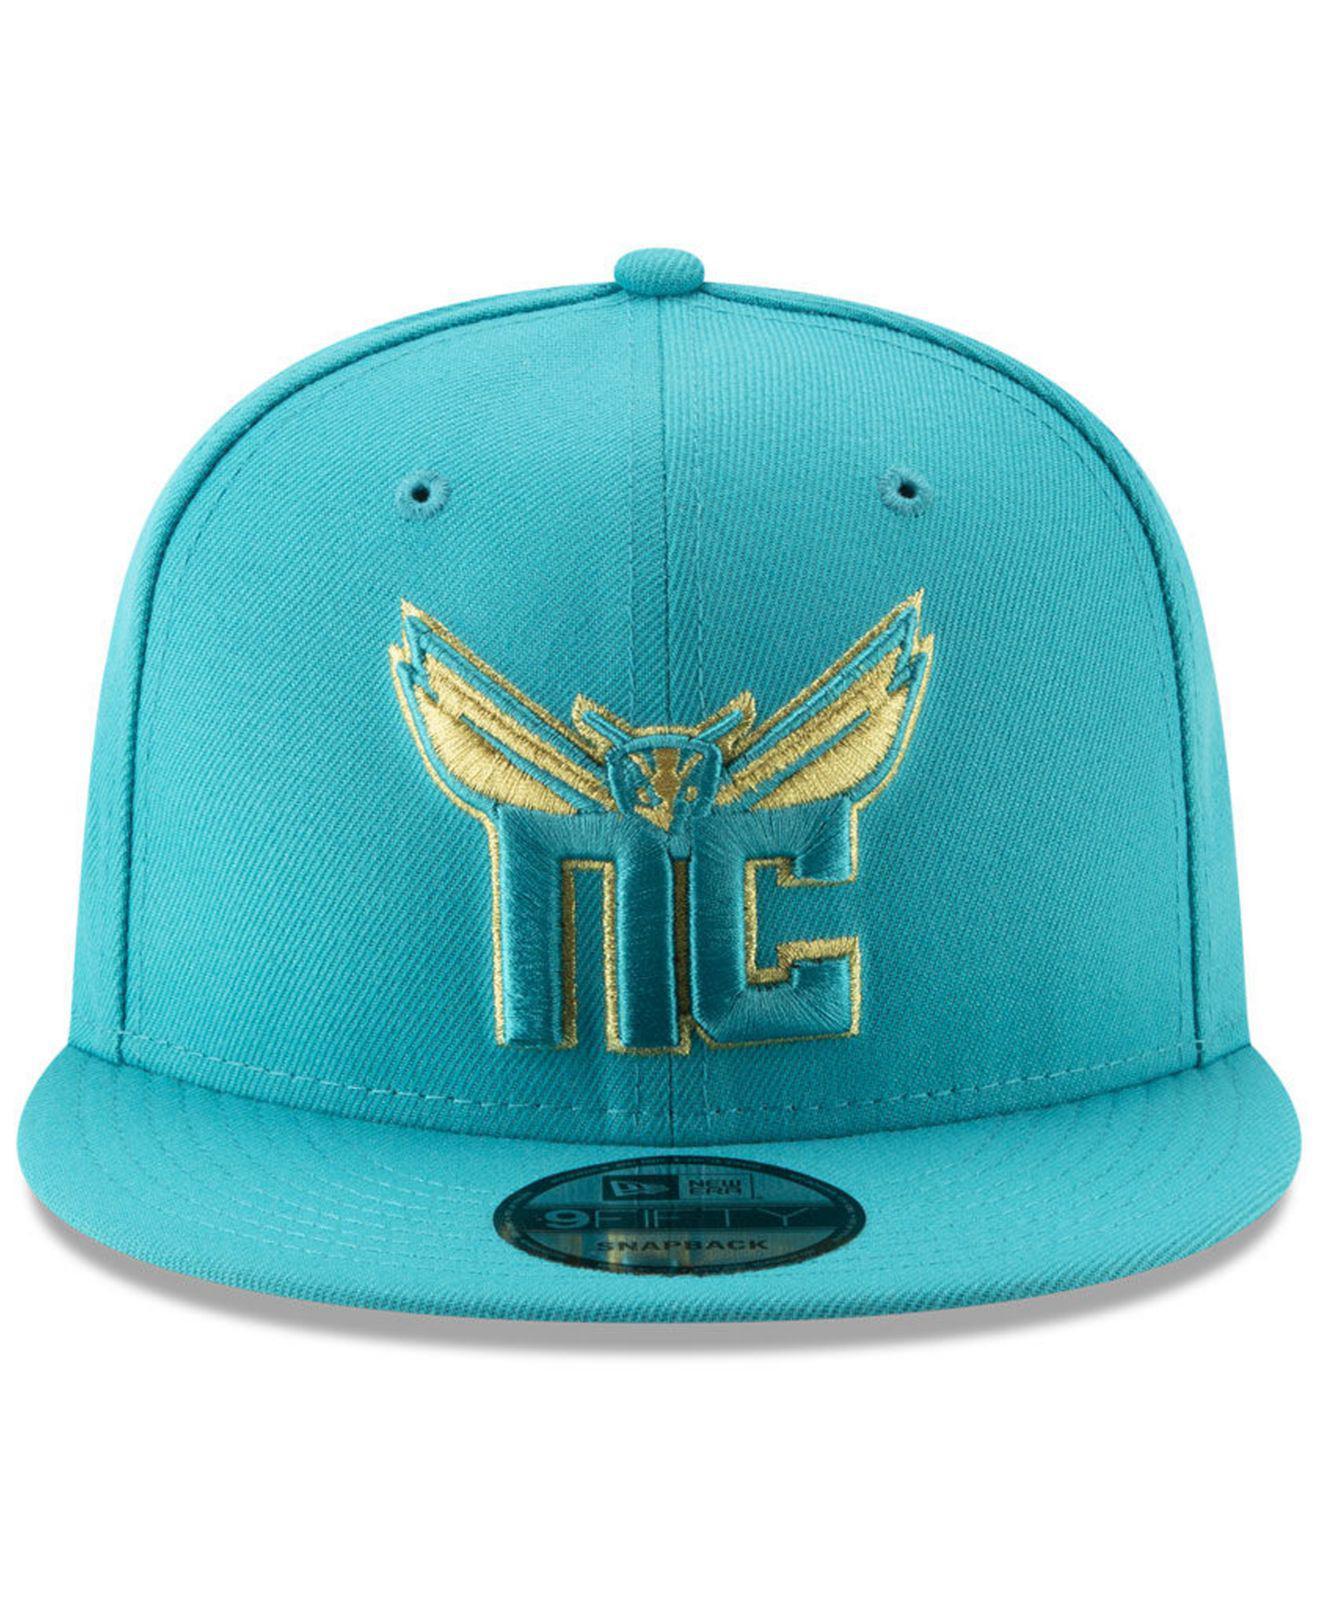 finest selection f252c 44e61 ... order lyst ktz charlotte hornets mishmash 9fifty snapback cap in blue  for men 65239 6e078